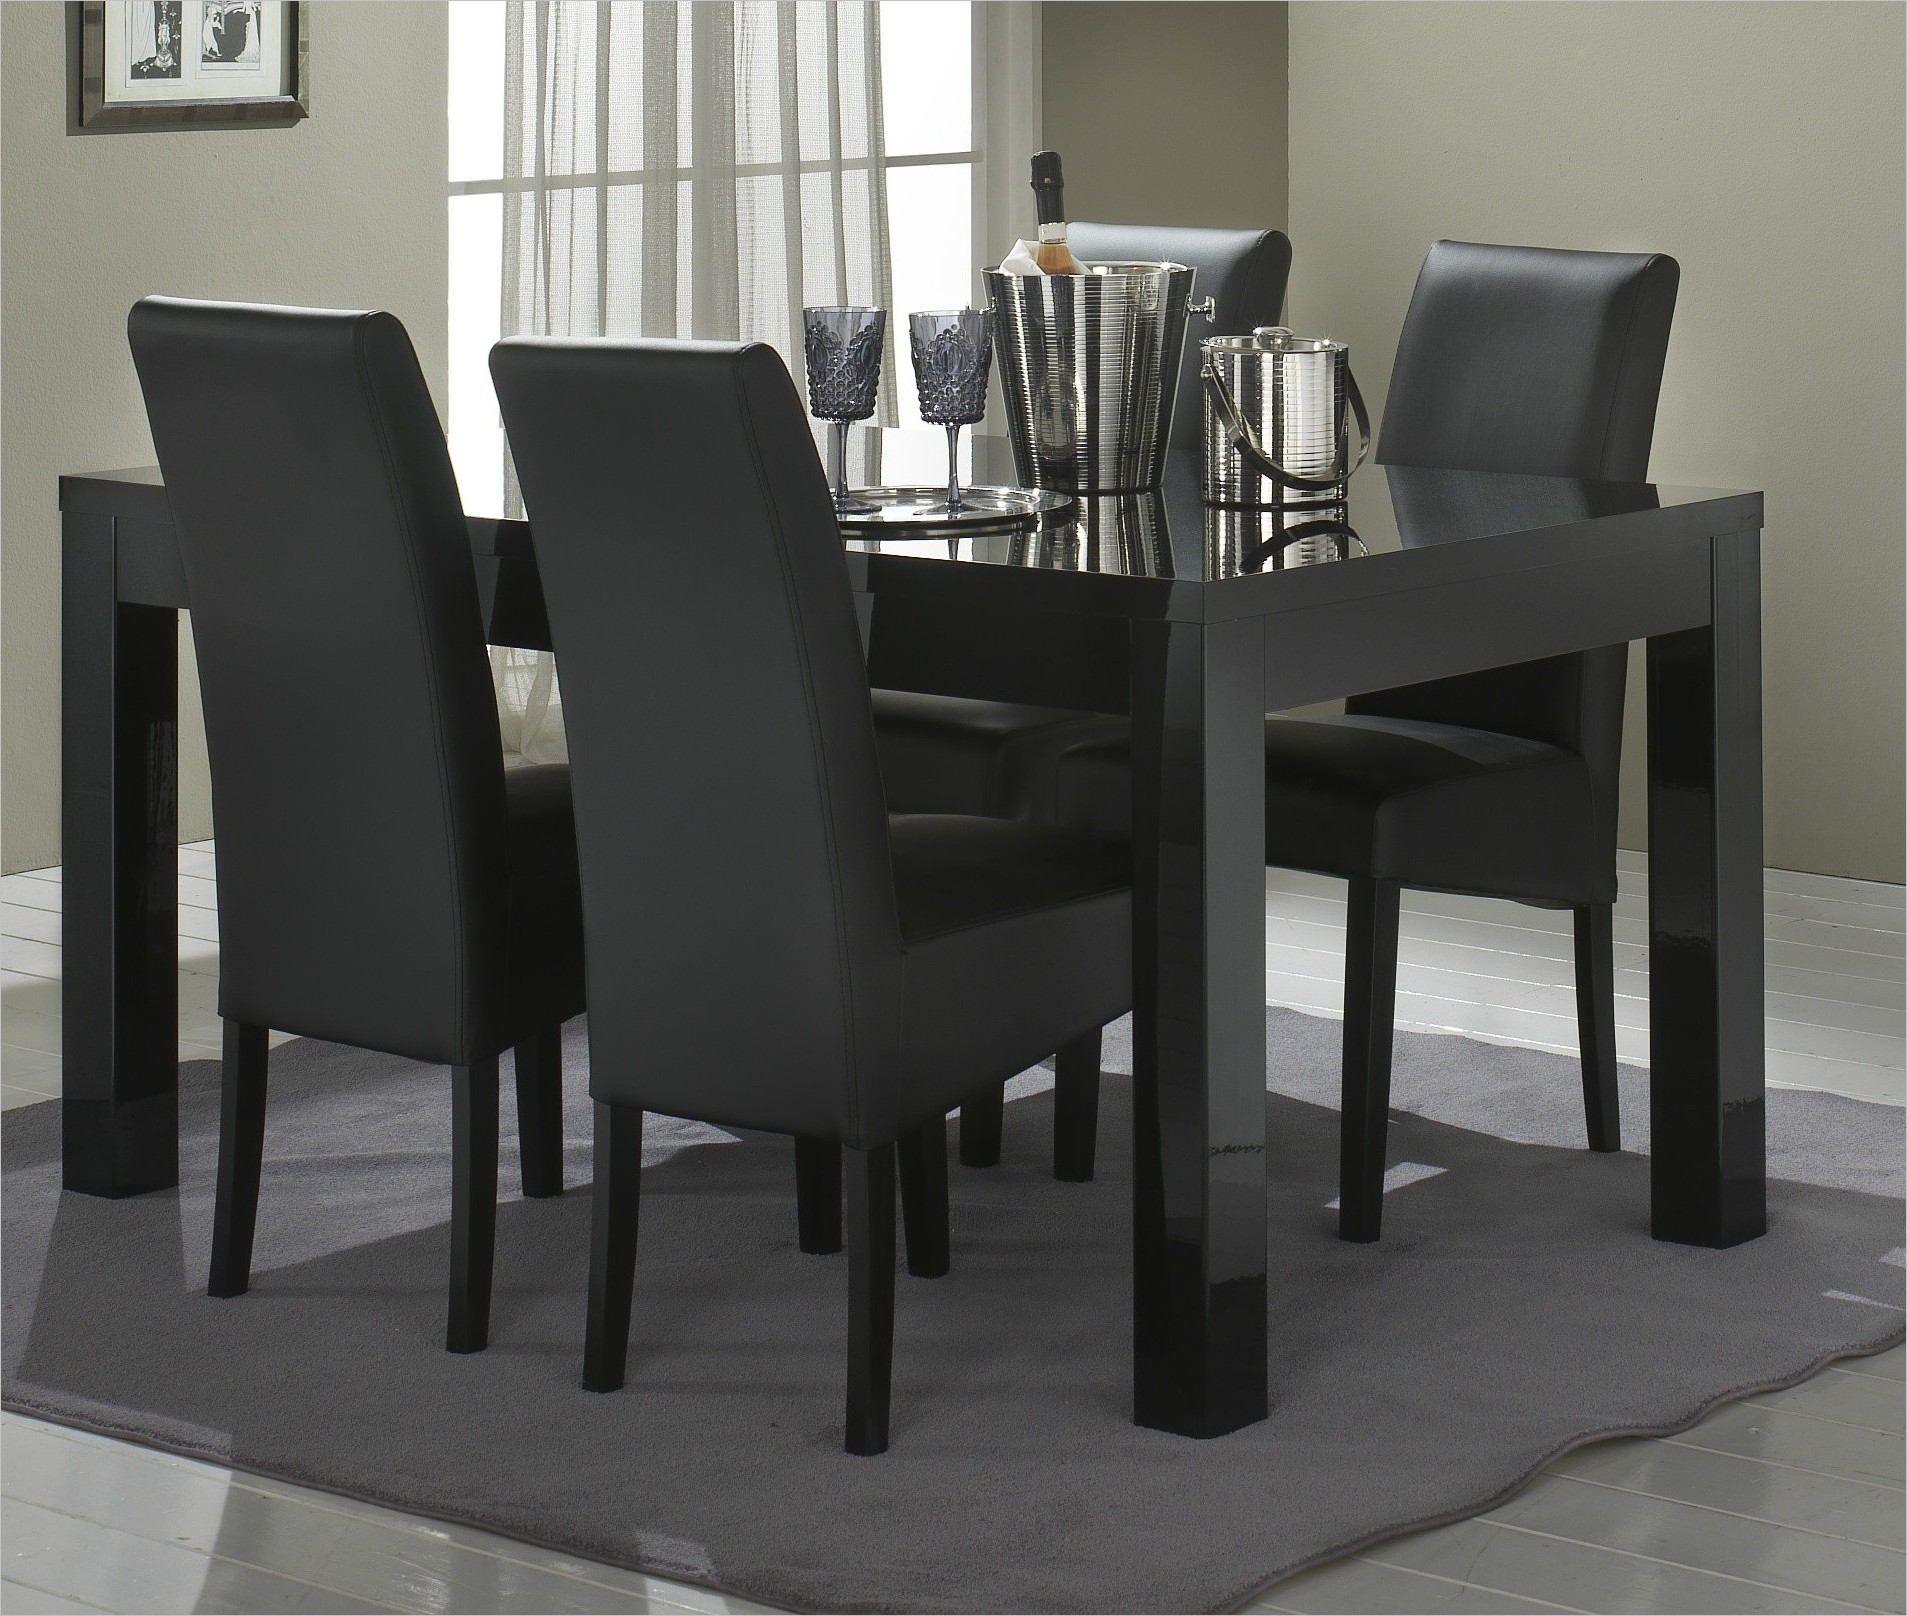 Table Salle A Manger Moderne Pas Cher In 2019 | Black Dining concernant Table Salle À Manger Design Pas Cher